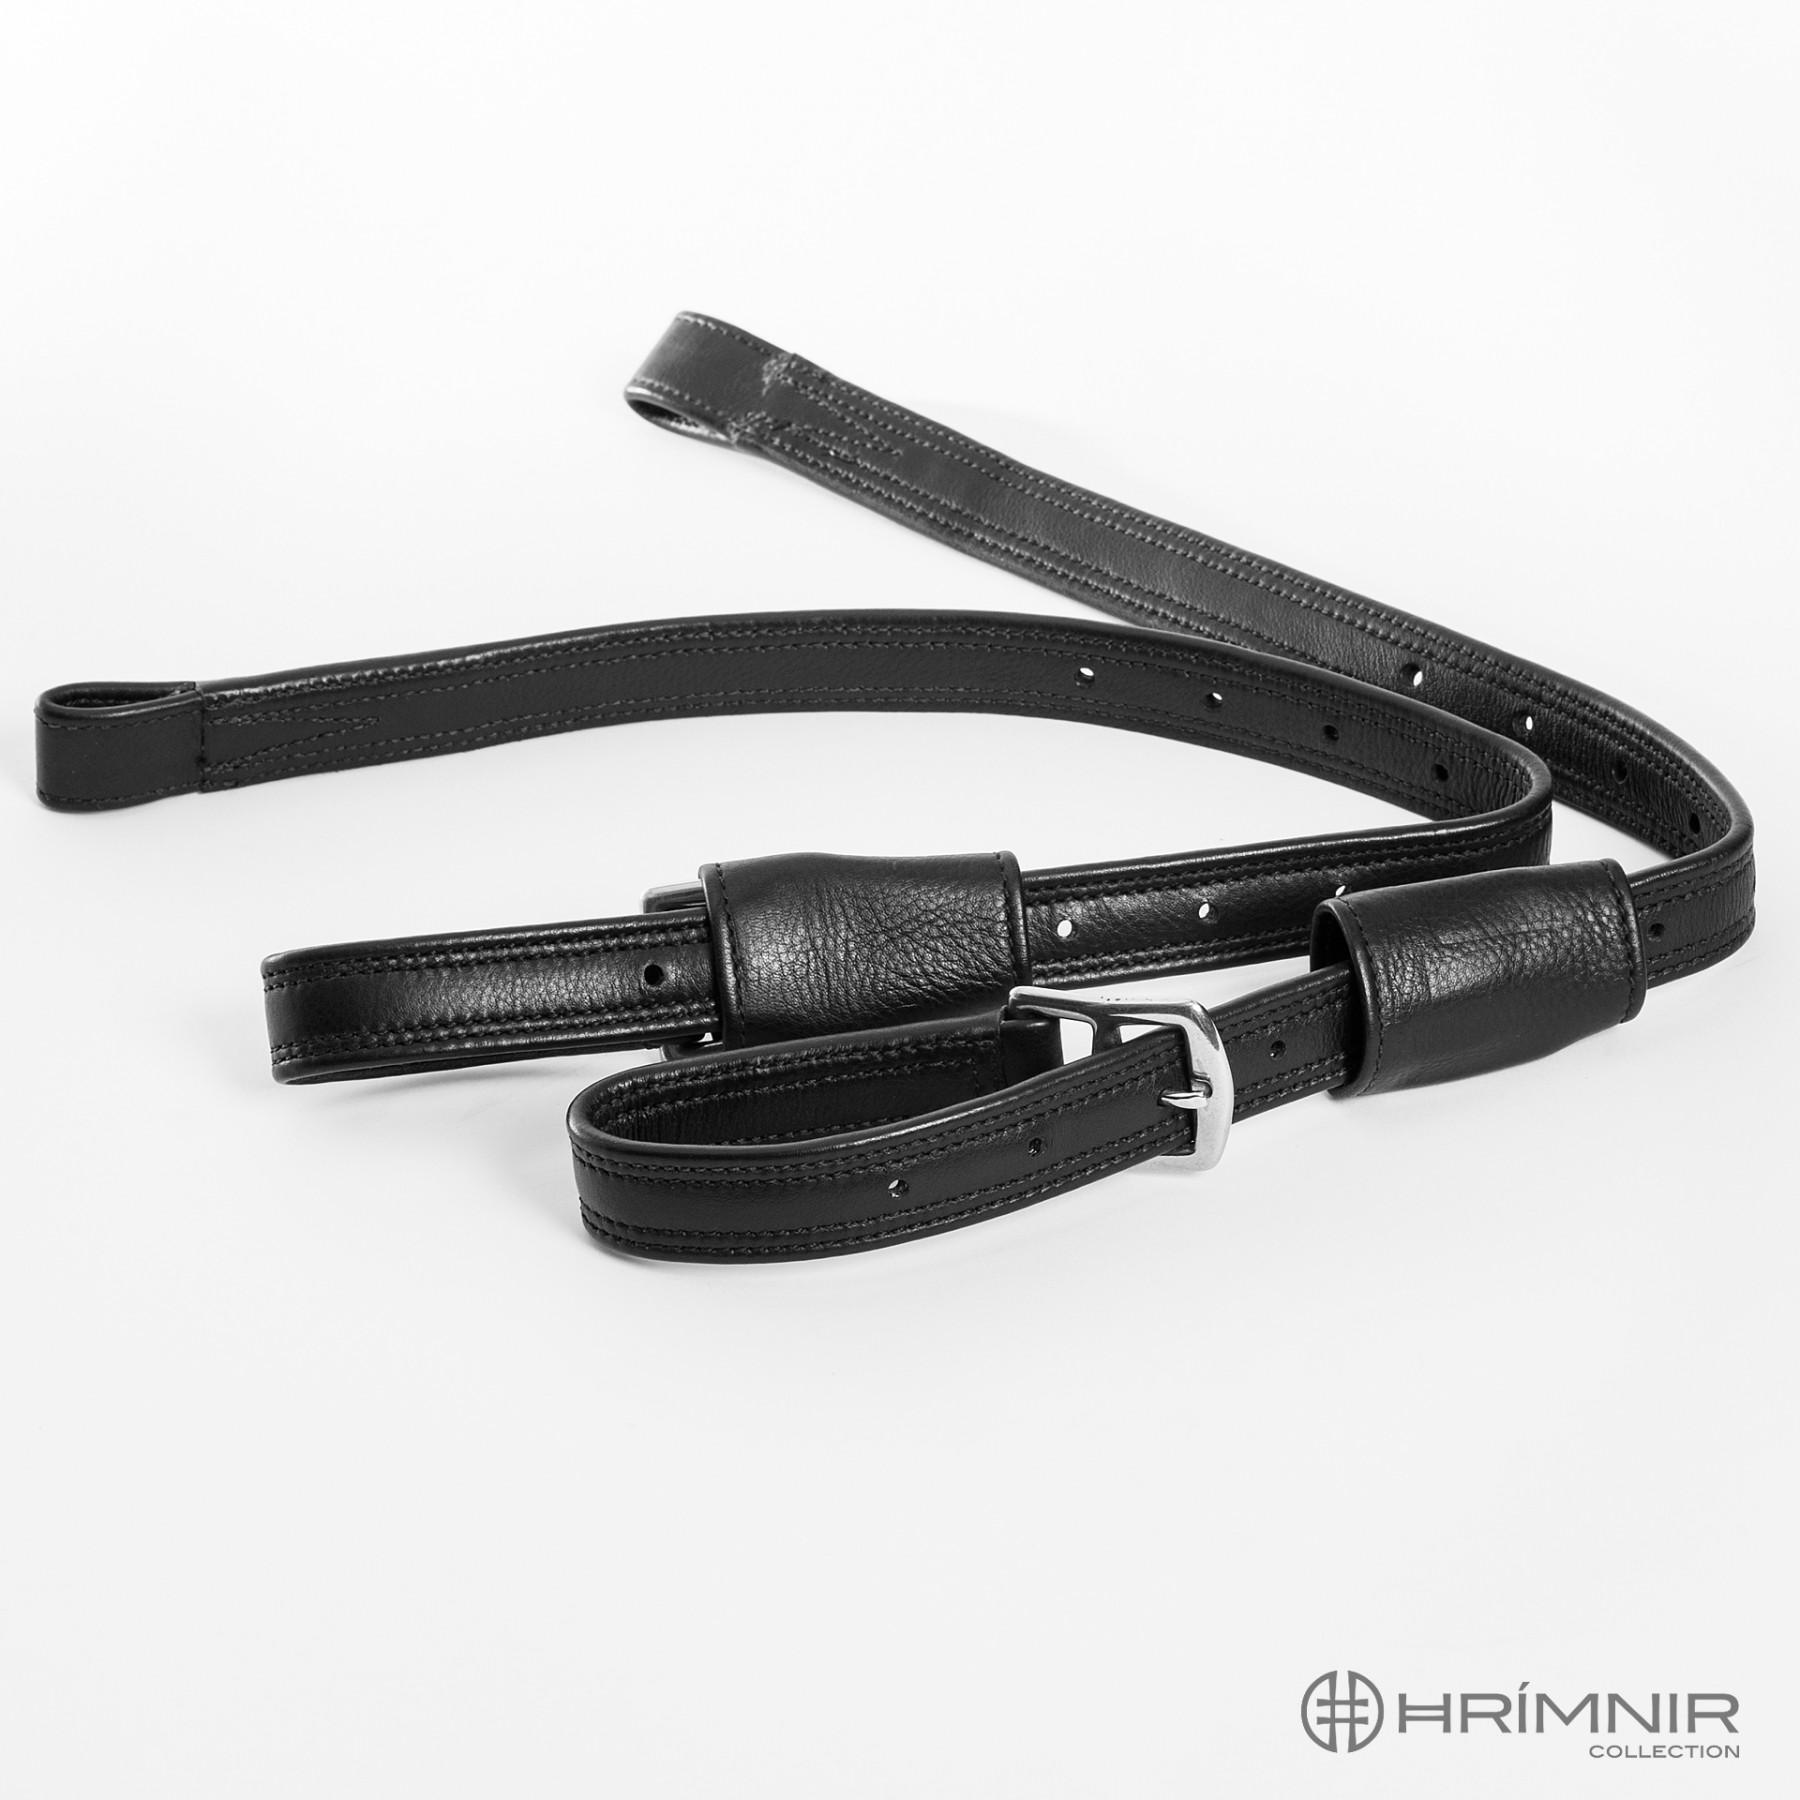 stirrup-leathers